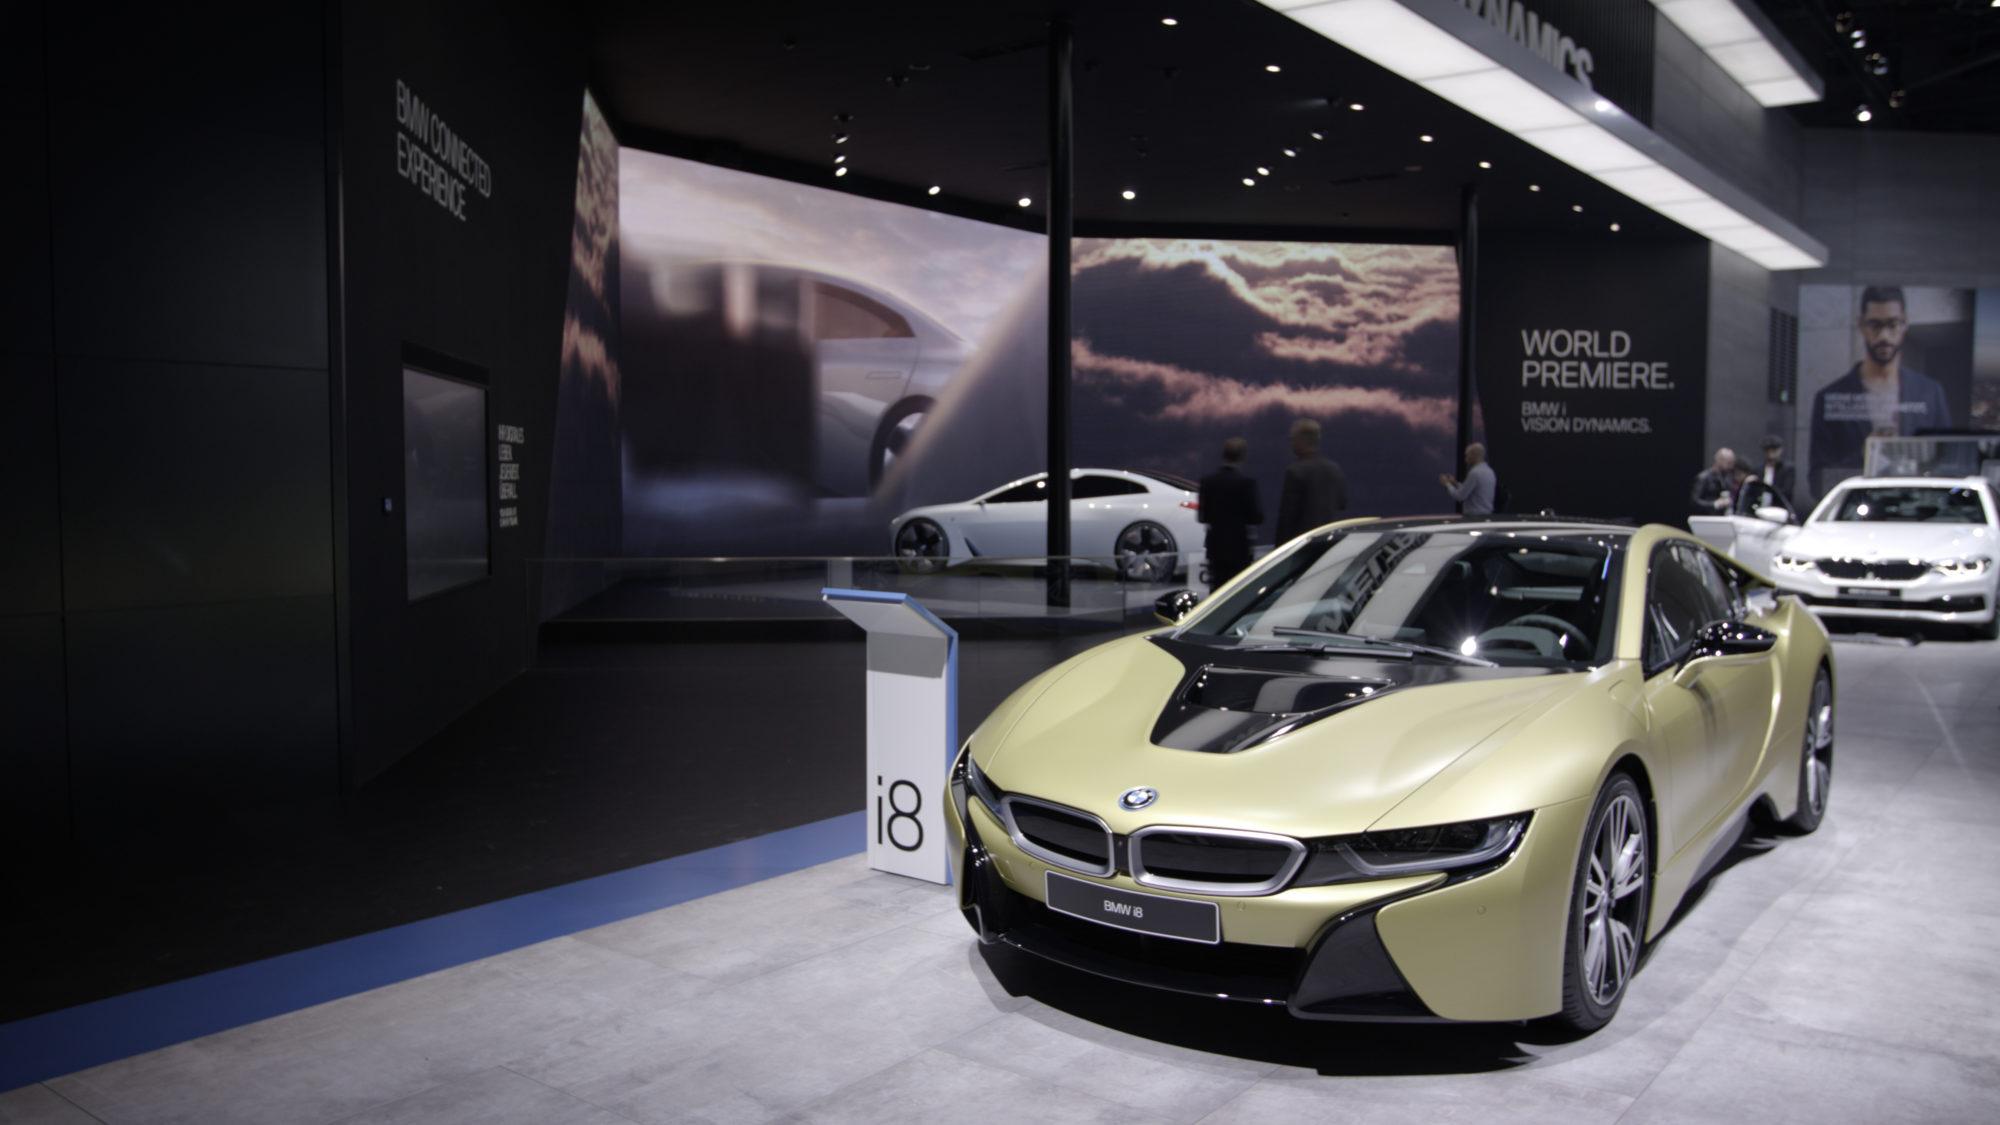 BMW_IAA_Doku_GradedSequence00090173-Wiederhergestellt Kopie